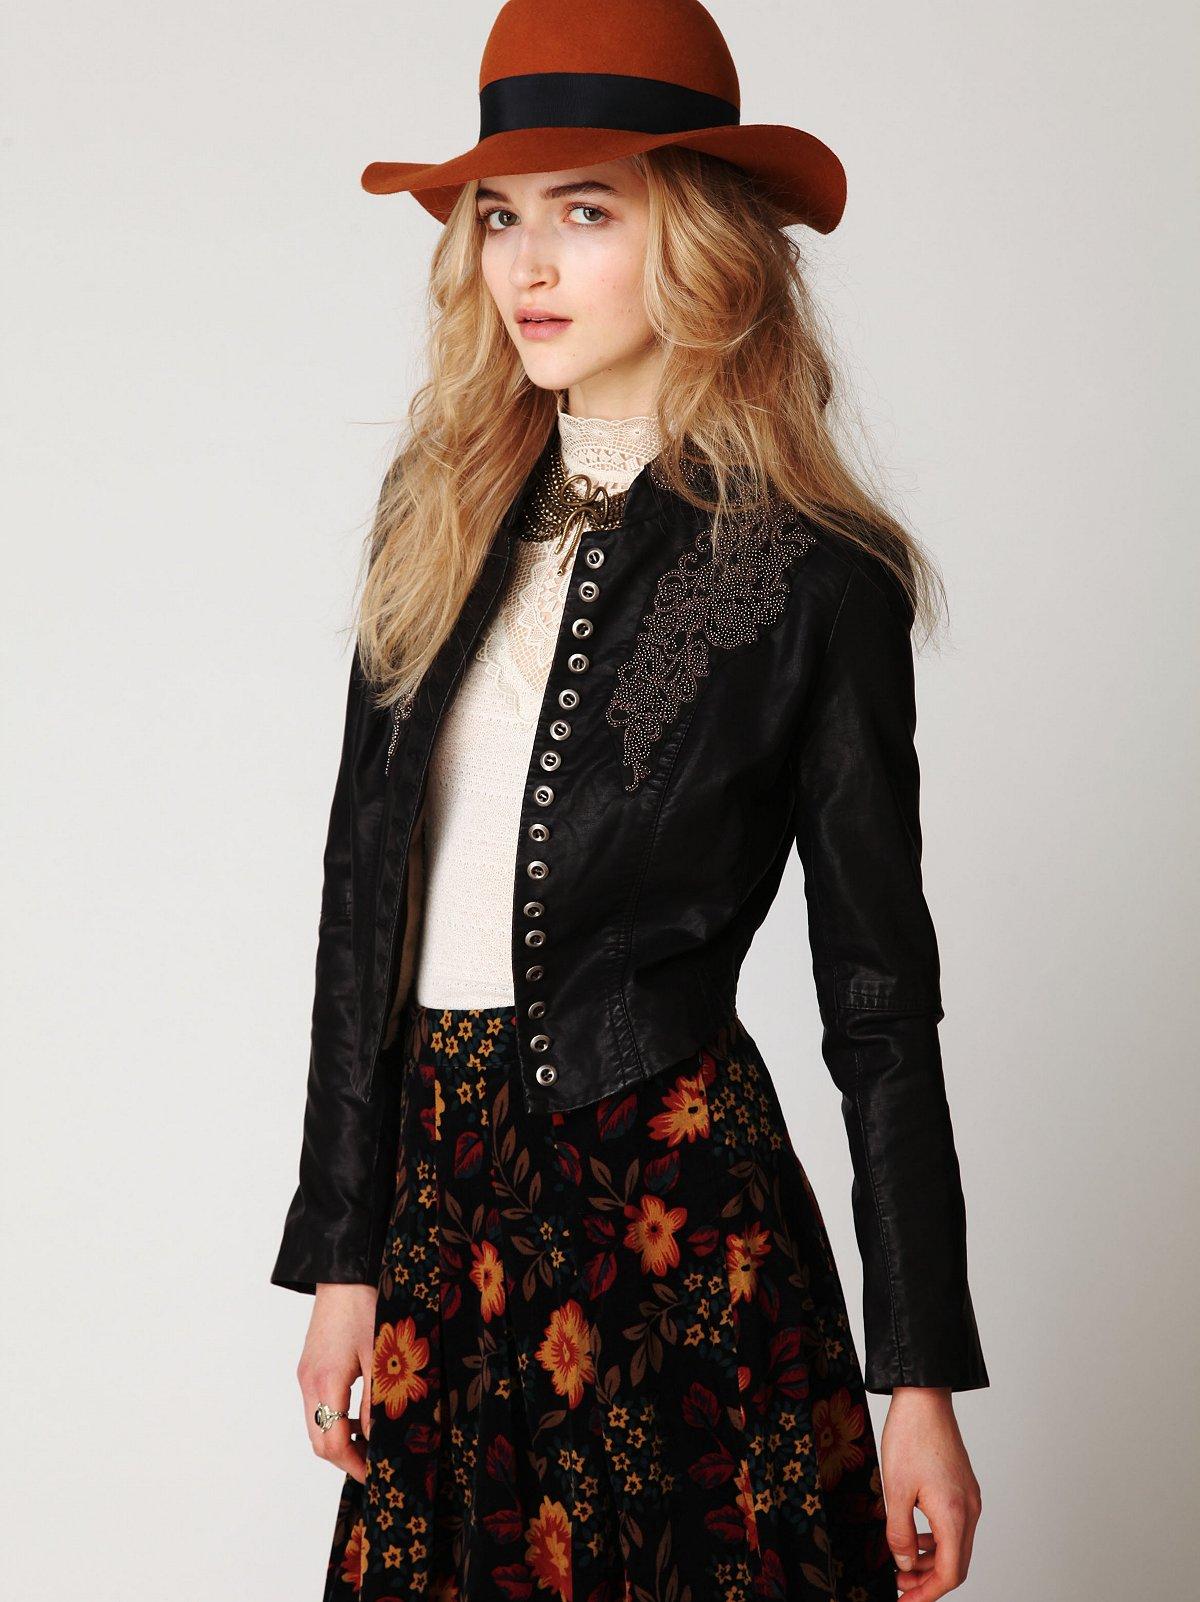 Embellished Vegan Leather Jacket